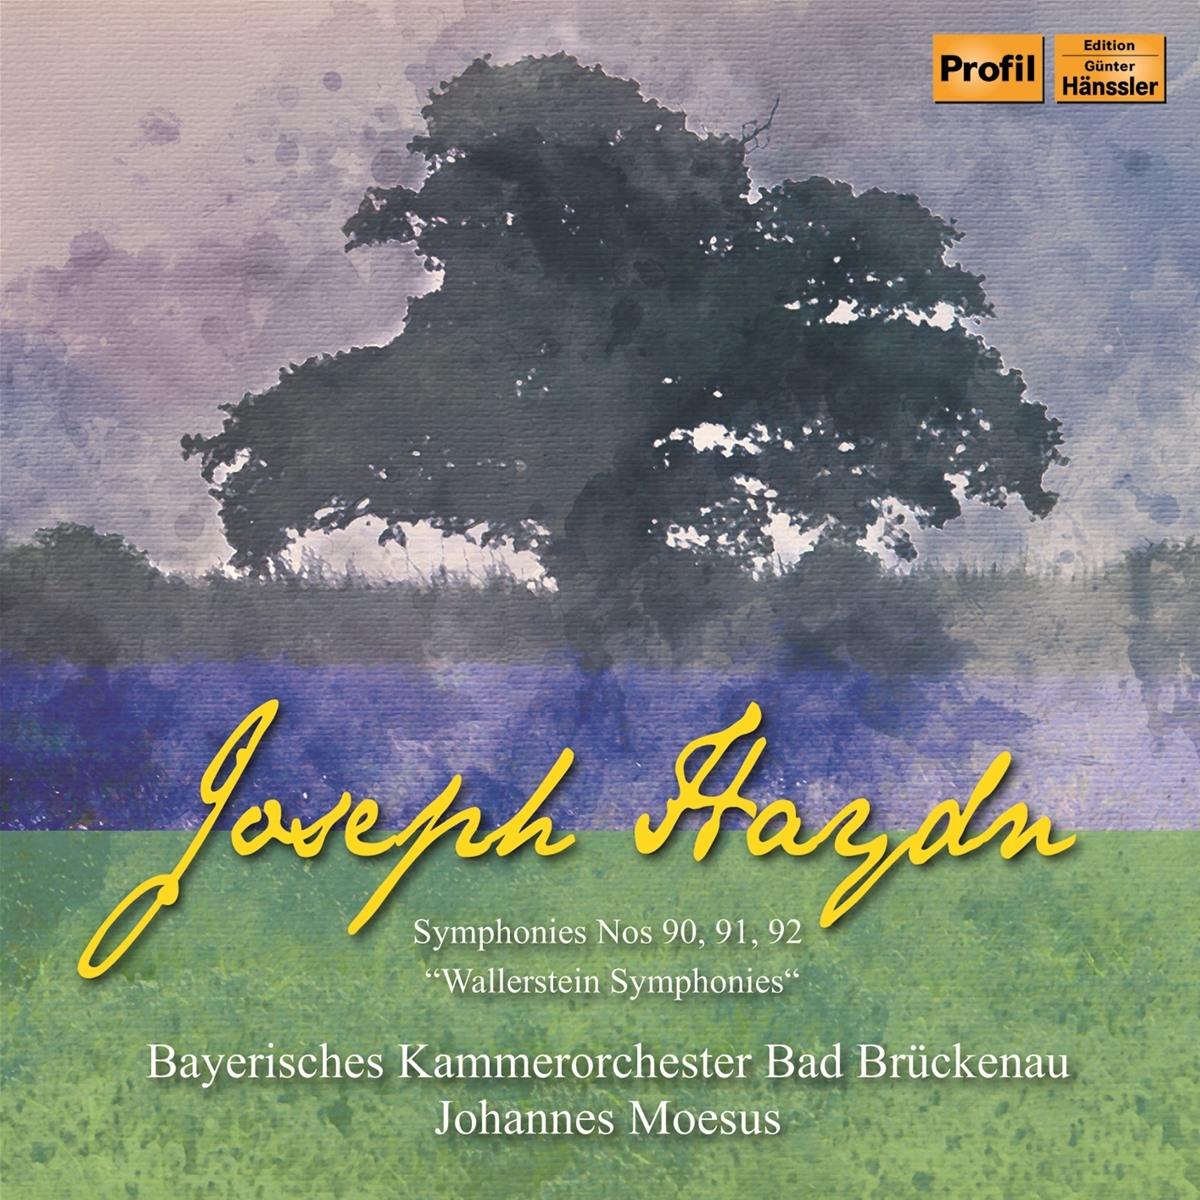 "Haydn ""Wallerstein Symphonies"""